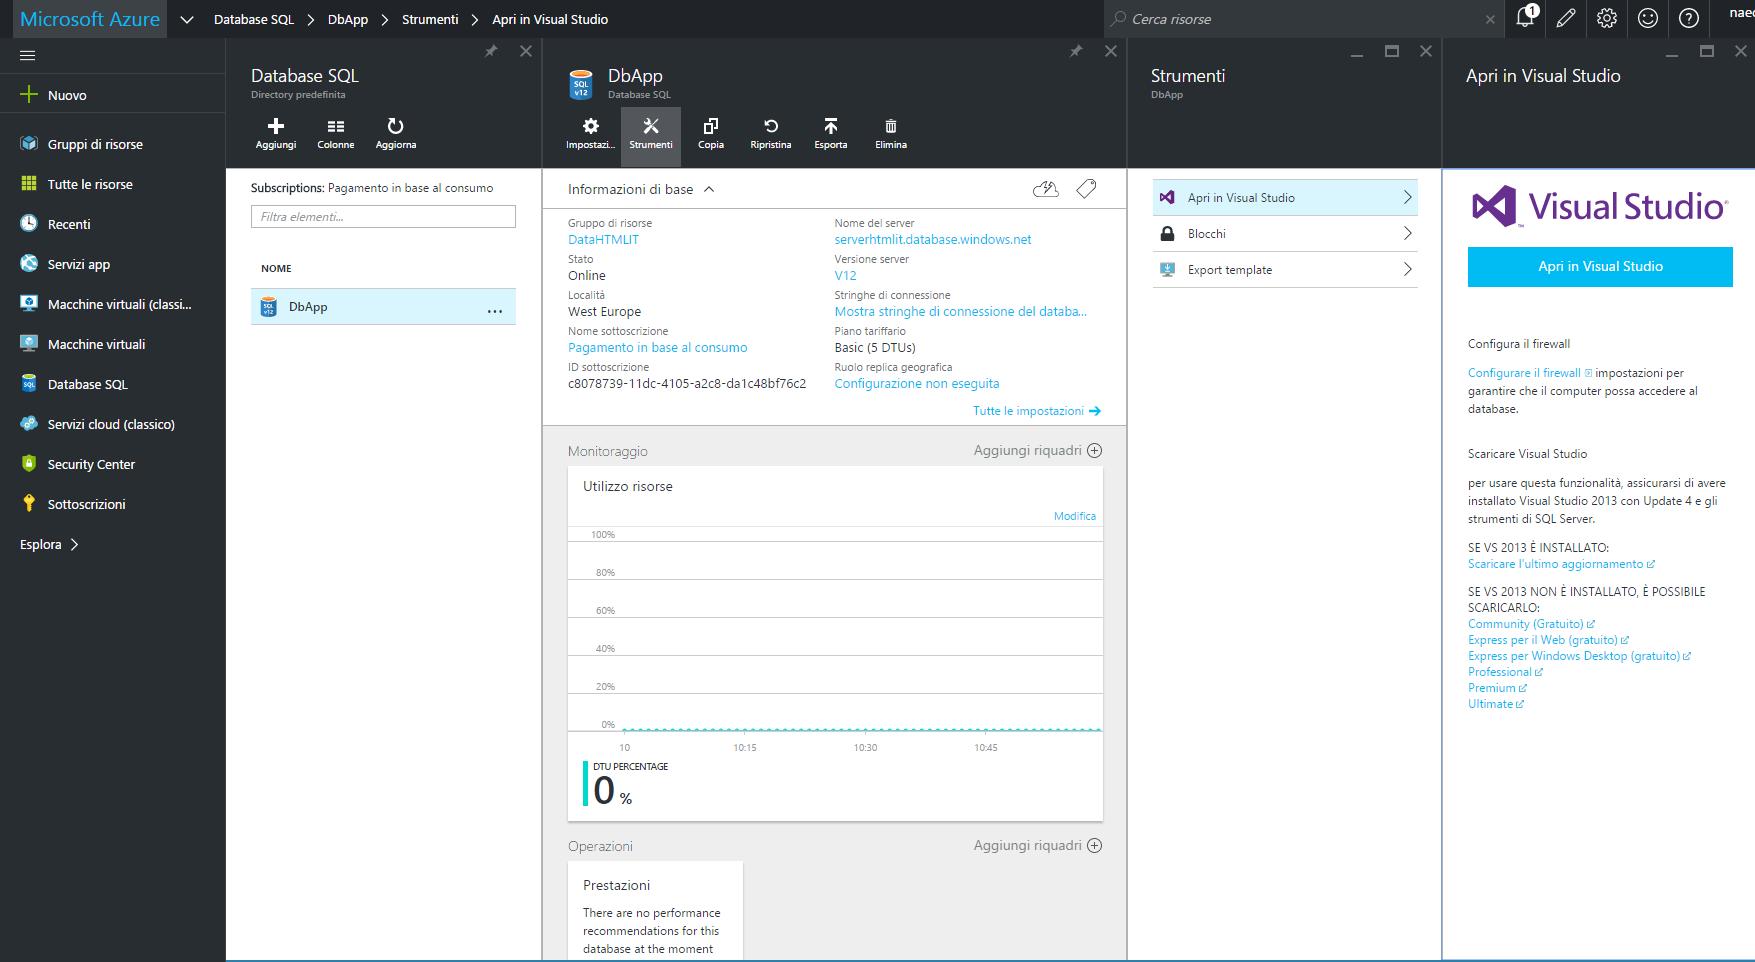 Apertura del database in Visual Studio